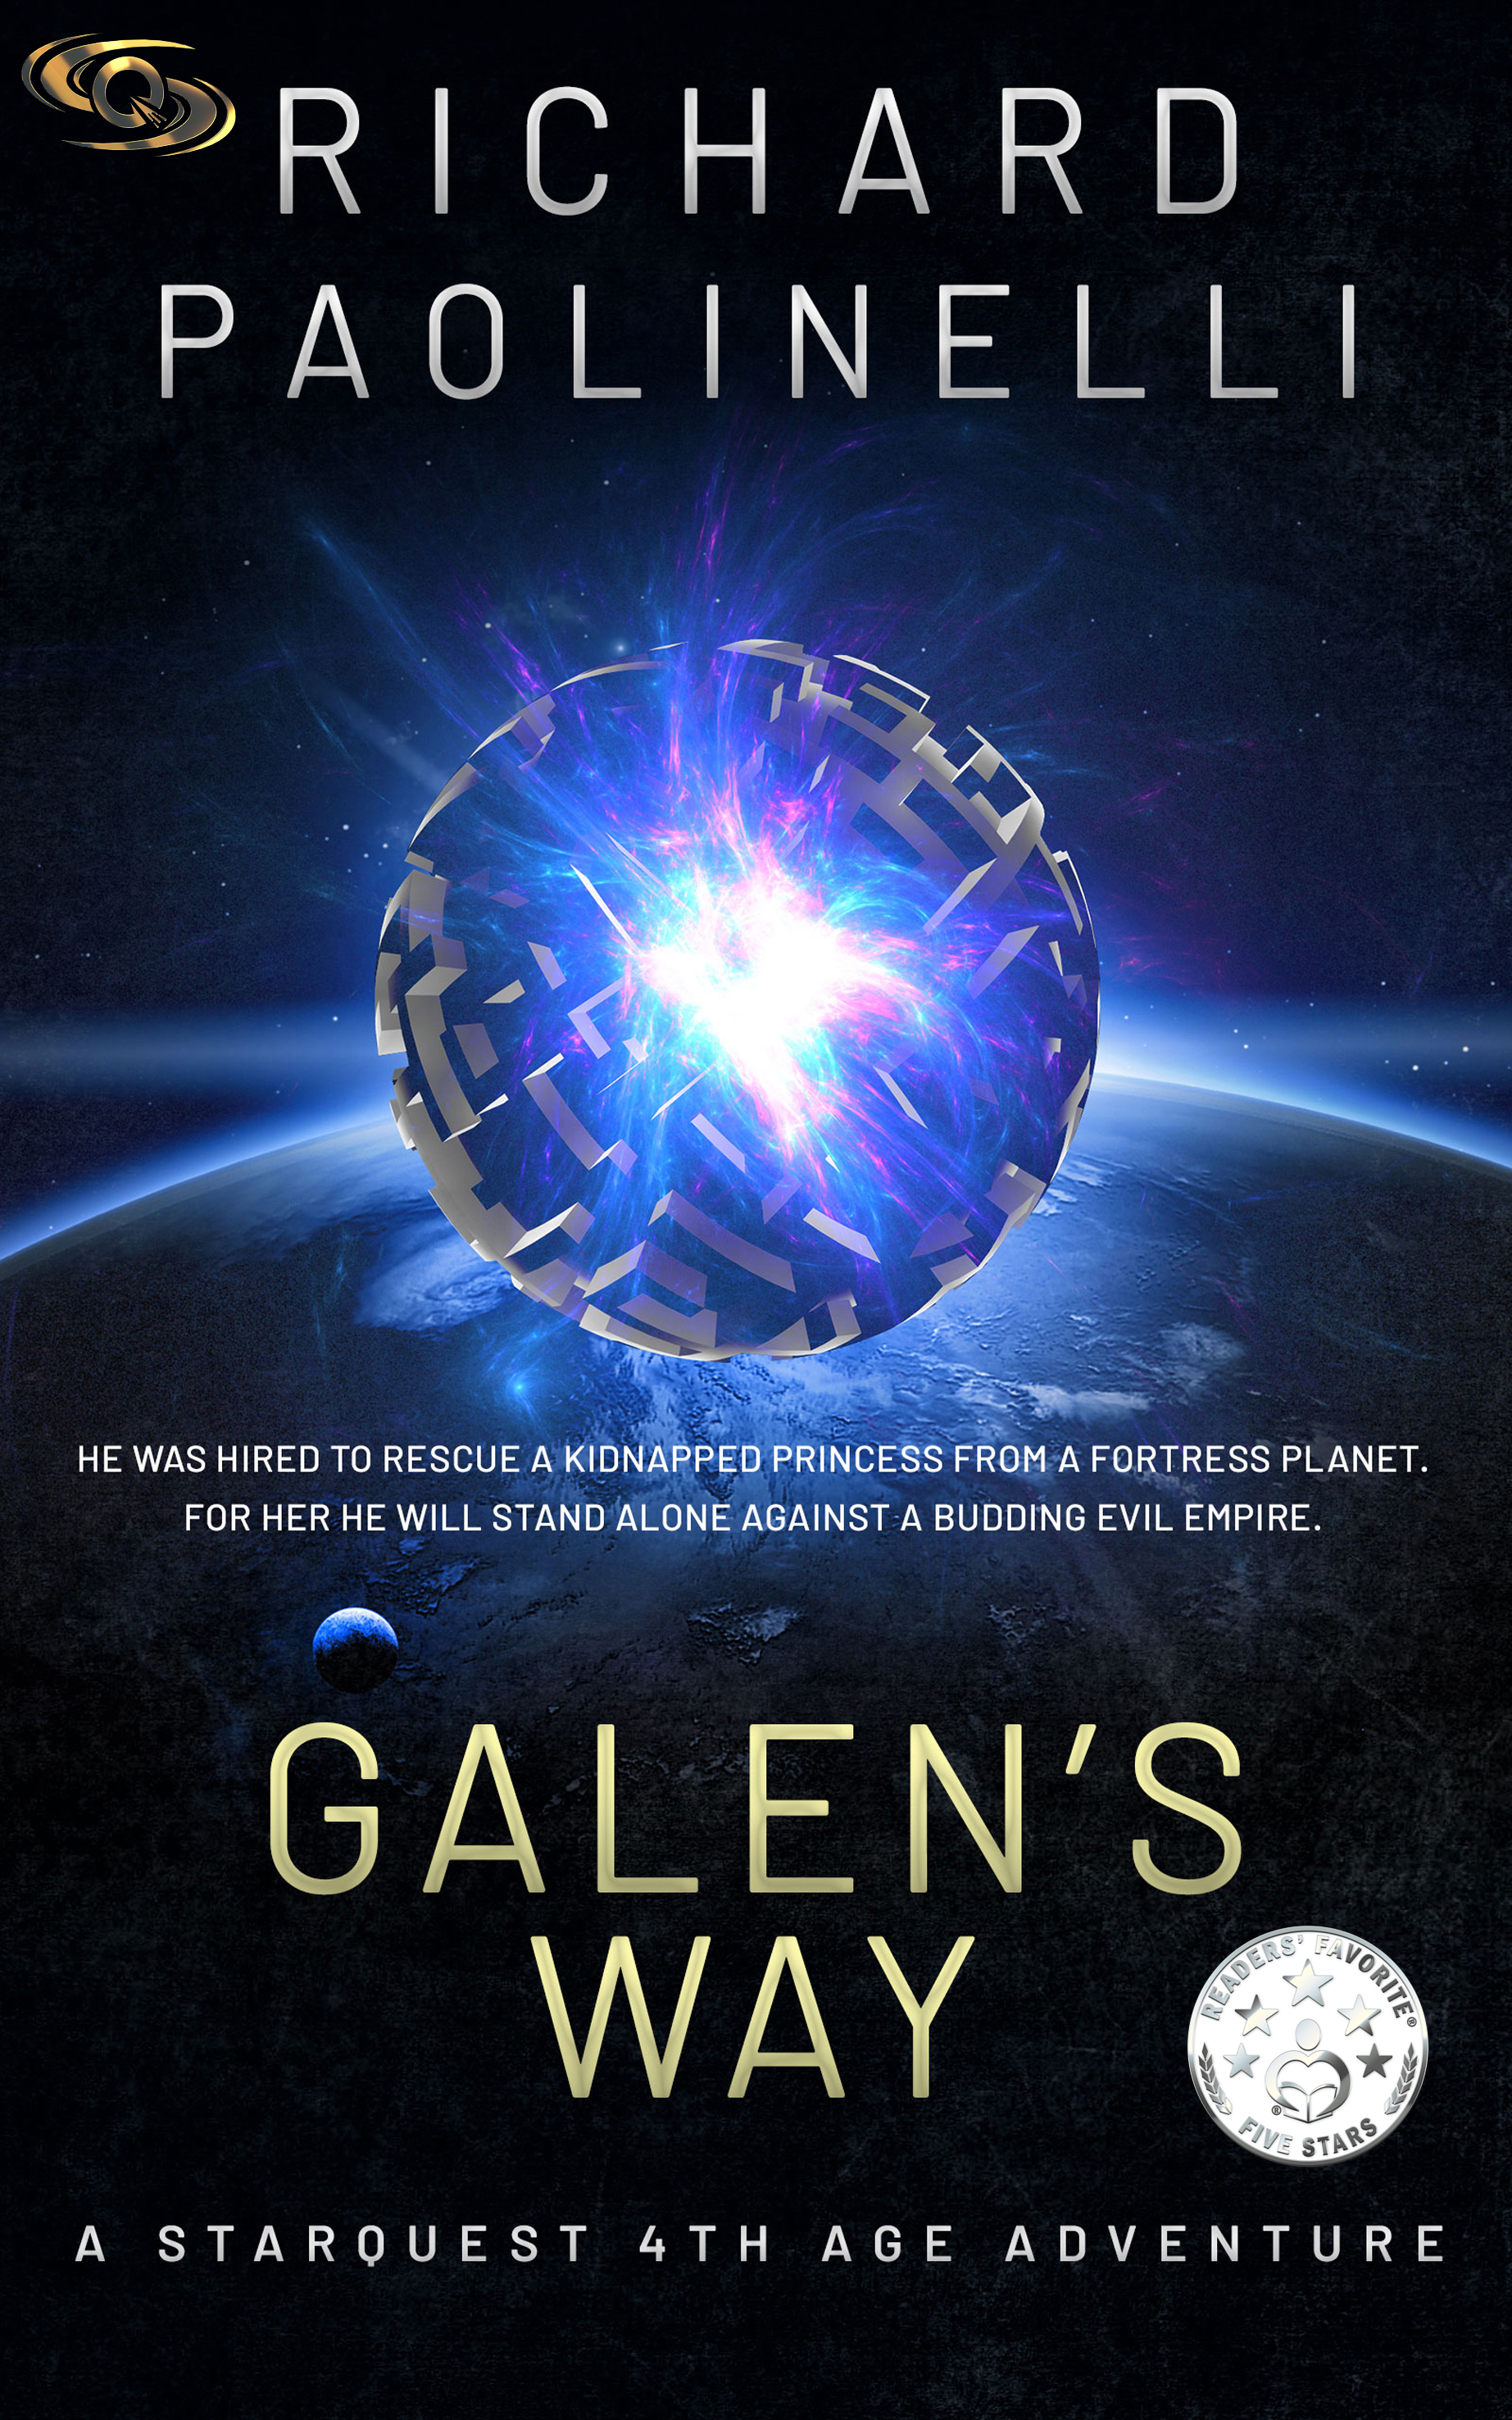 GALENS_WAY_COVER_300_DPI copy